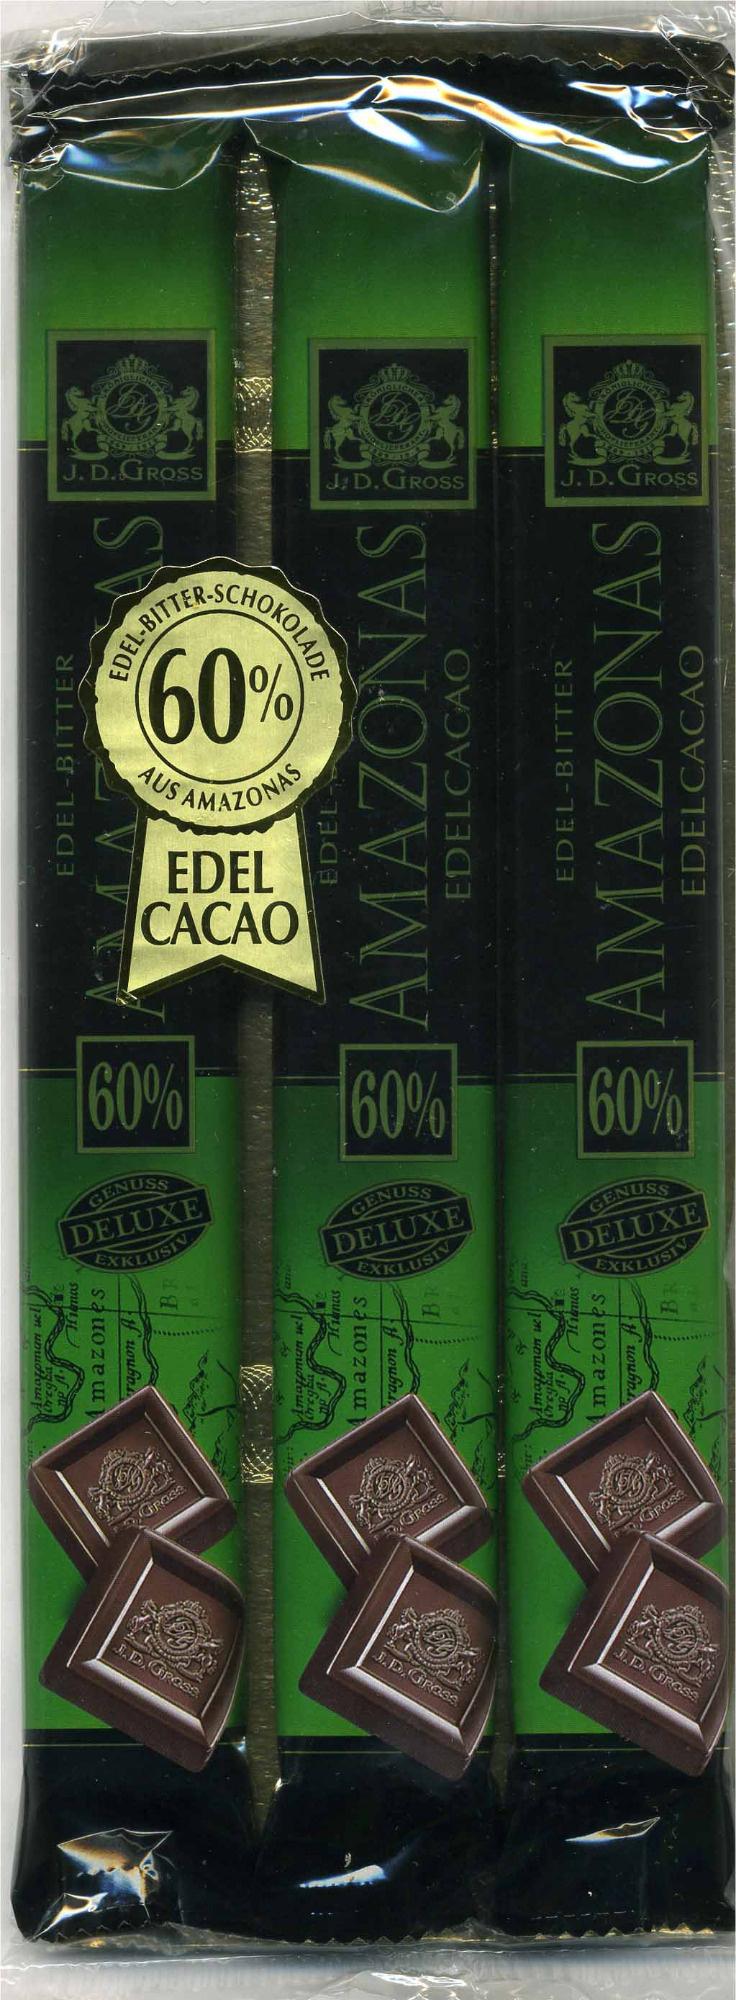 Edel-Bitter-Schokolade Amazonas 60% Kakao - Producte - de